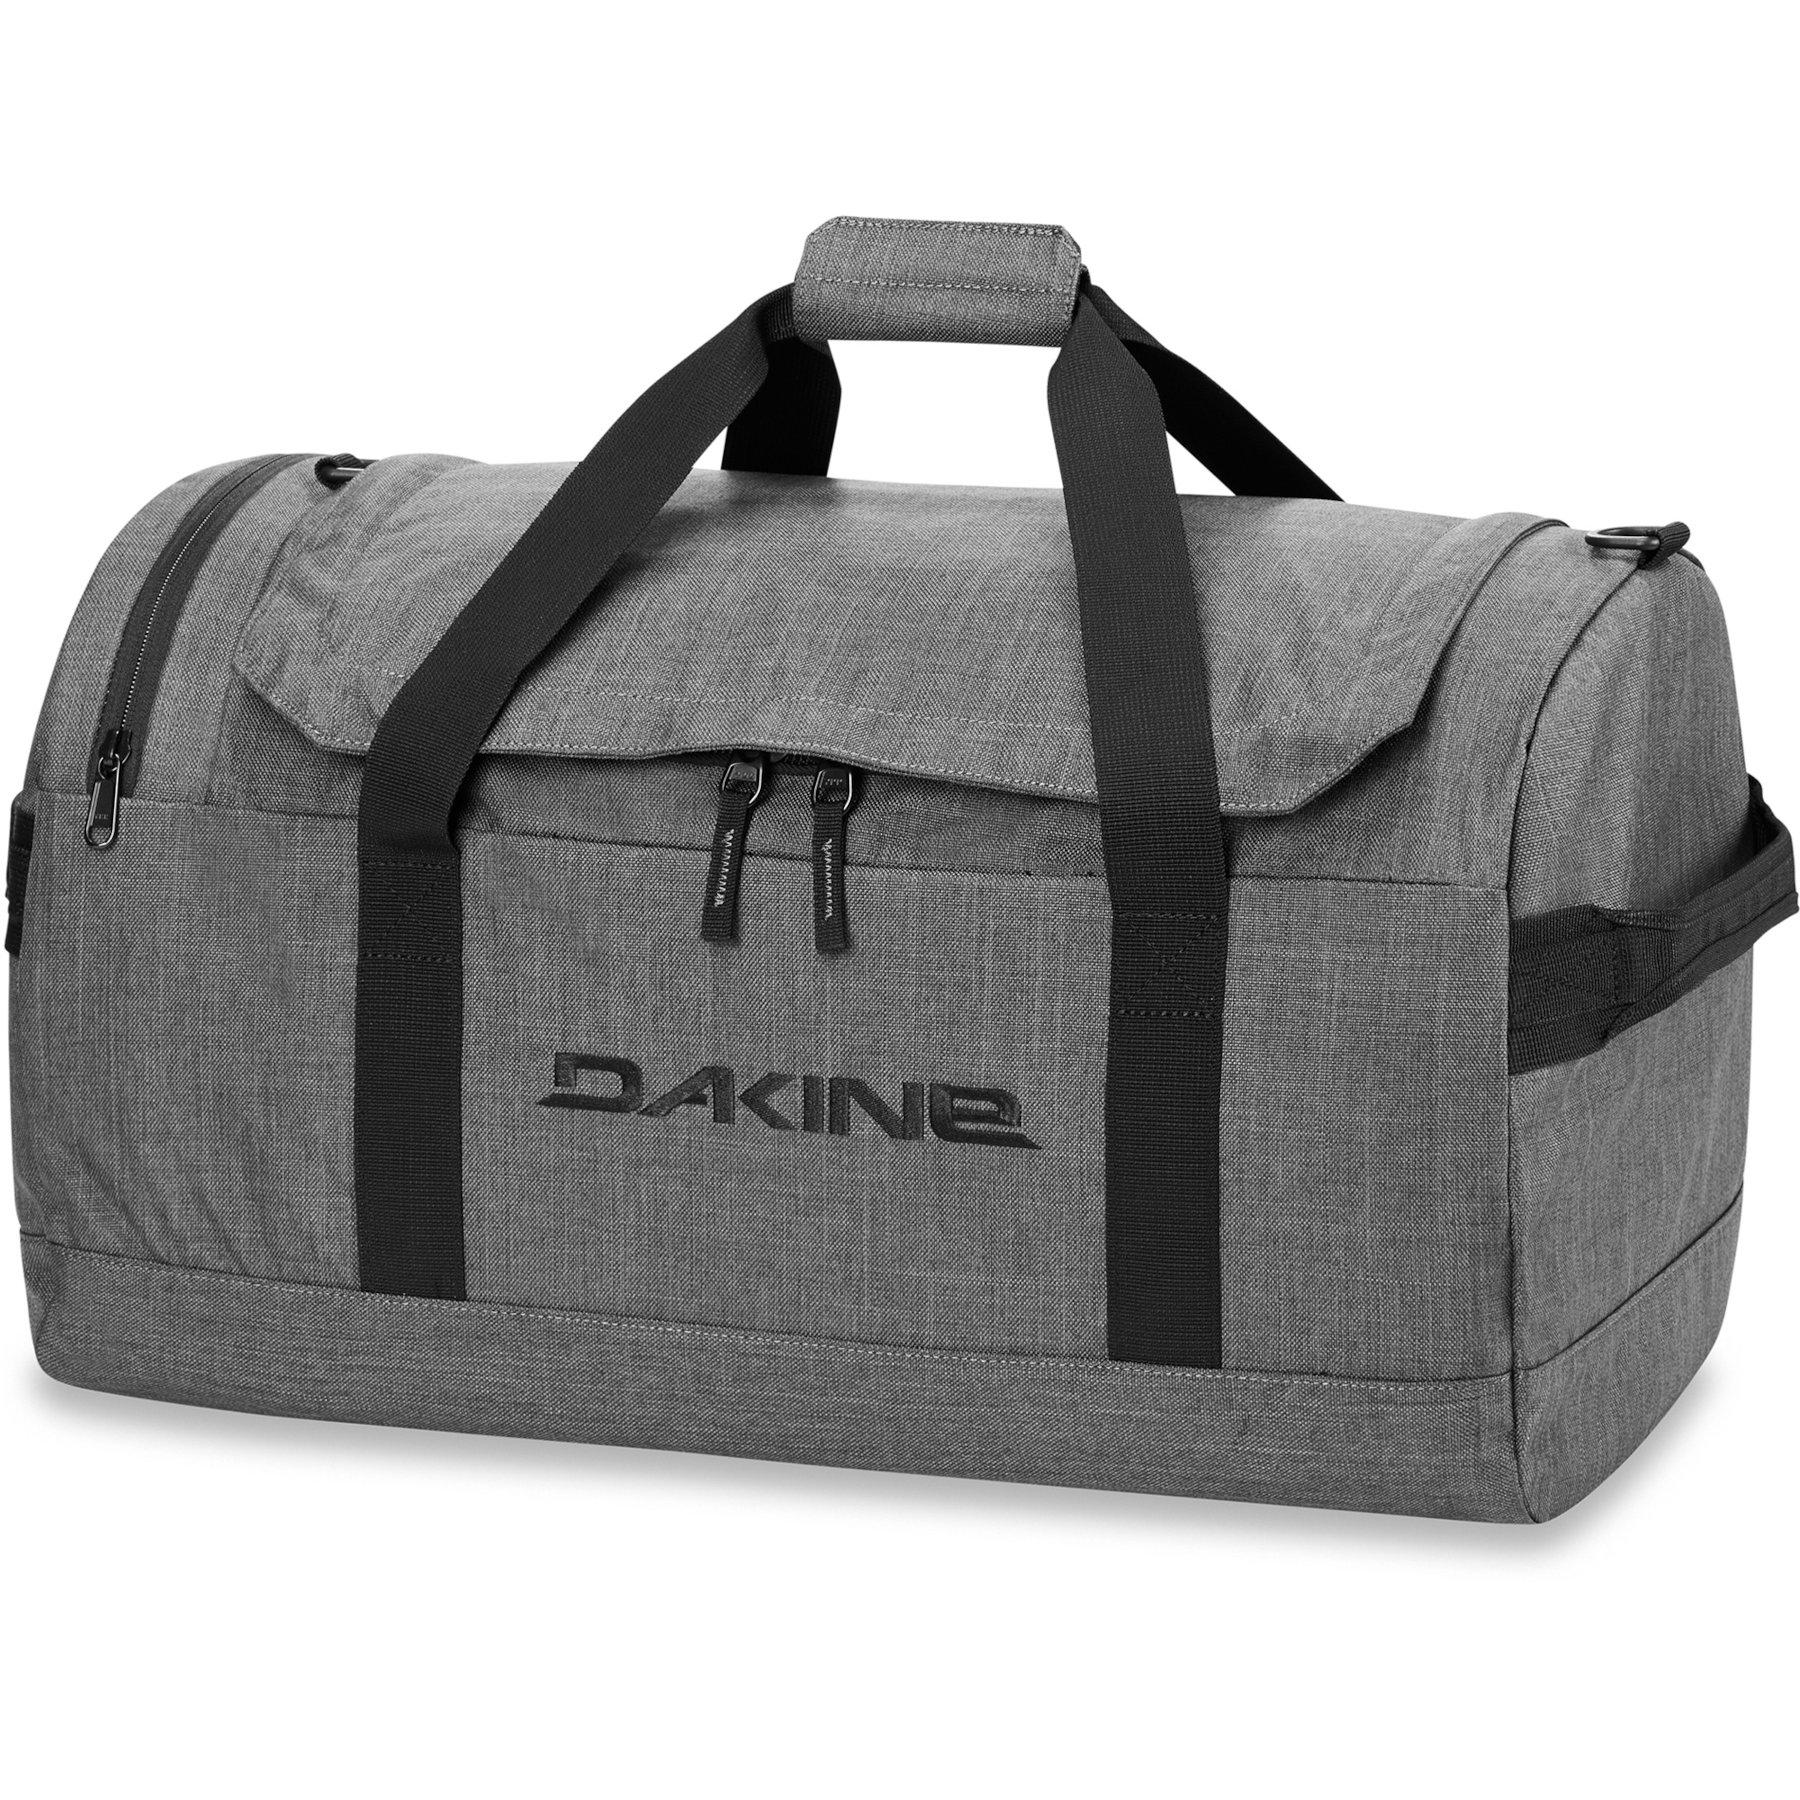 Dakine EQ Duffle 50L Bag - Carbon